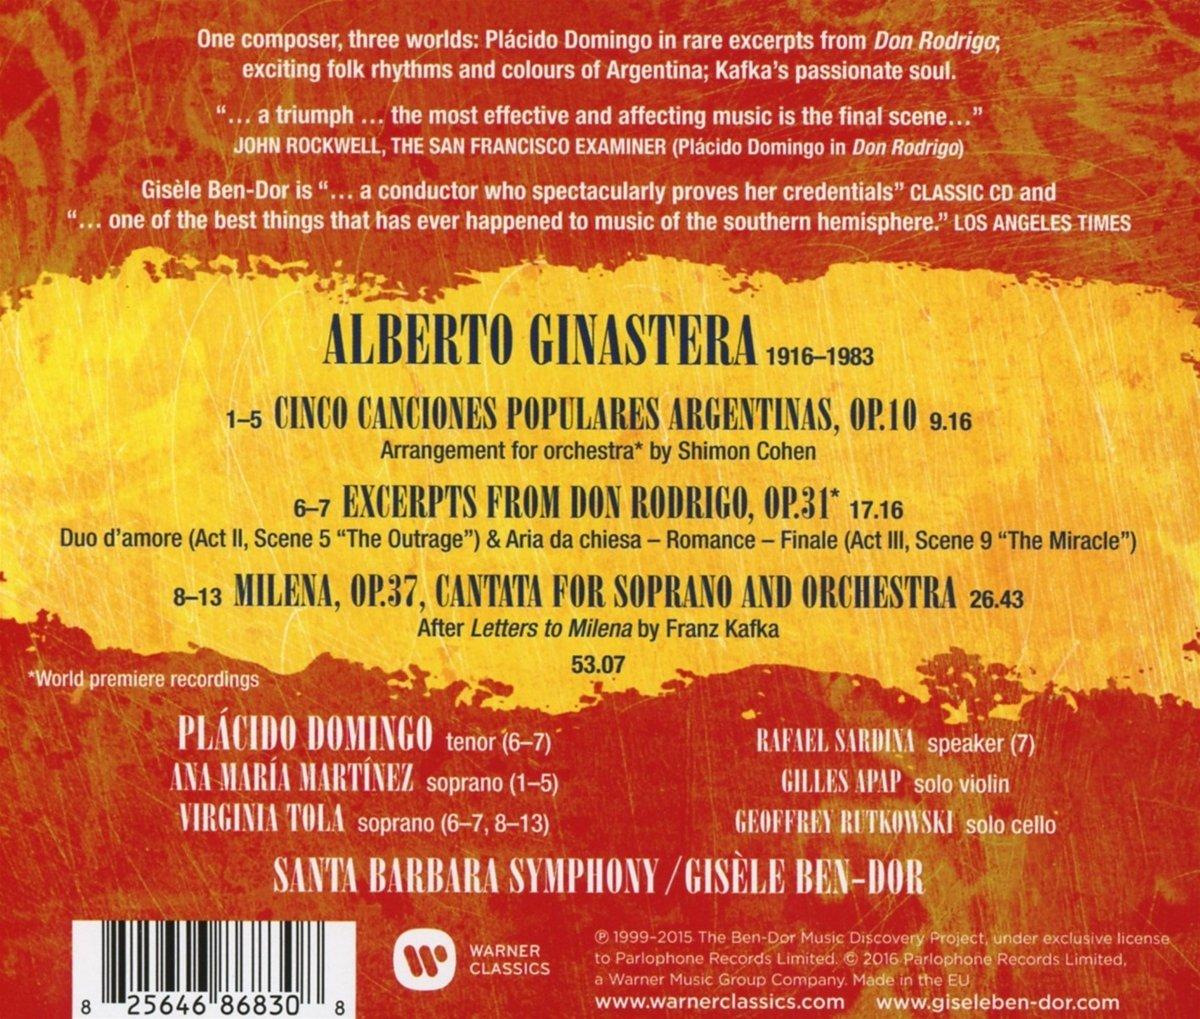 Ginastera: 5 Argentine Songs, Milena Cantata excerpts from Don Rodrigo